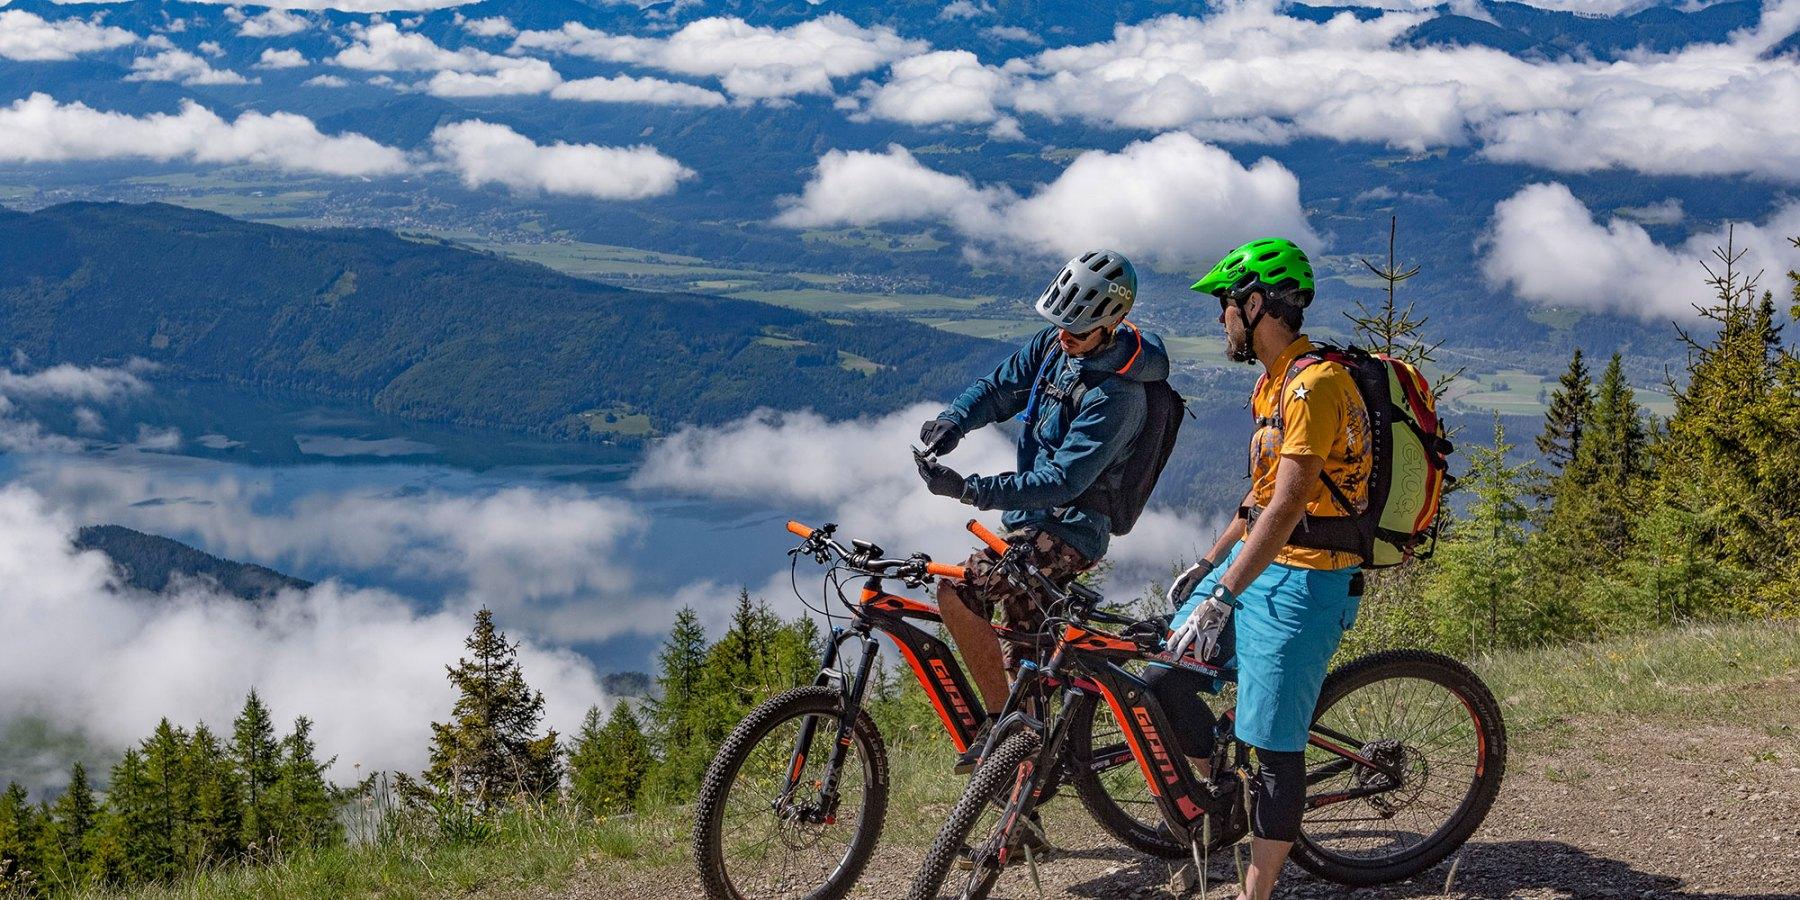 Smiley im Frühling - Mountainbiker